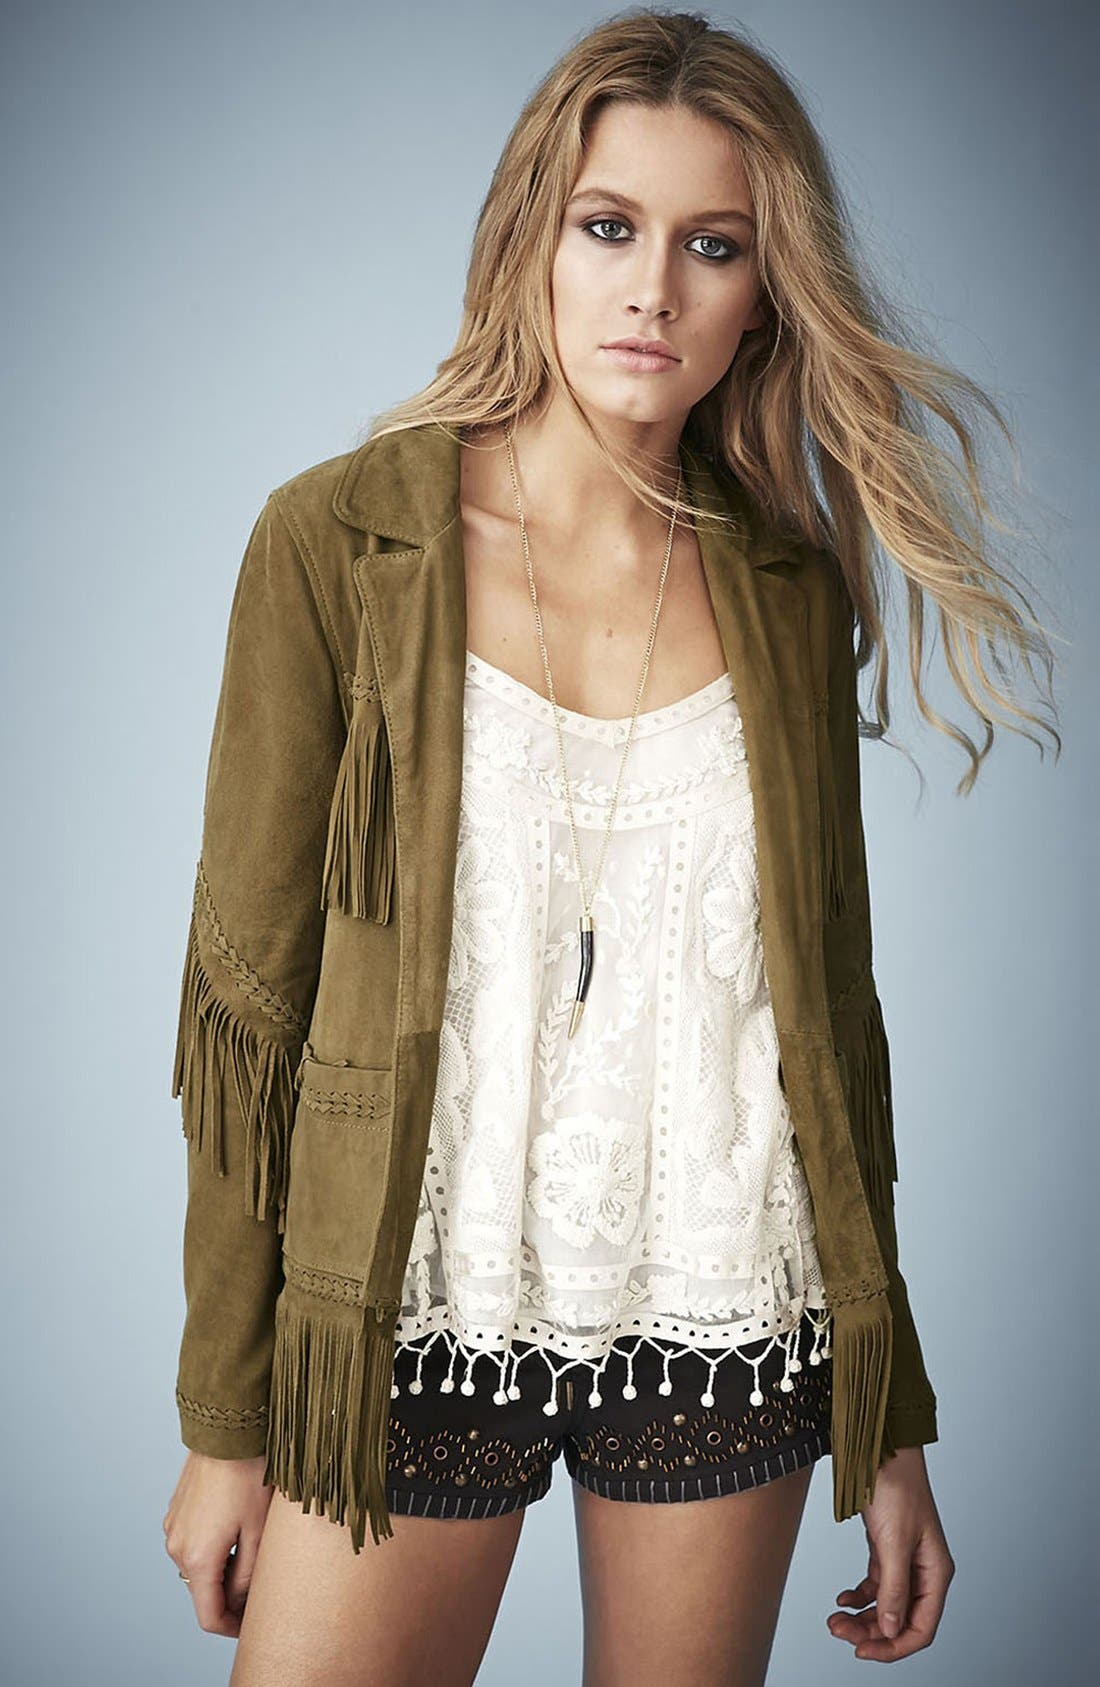 Alternate Image 1 Selected - Kate Moss for Topshop Fringed Suede Jacket